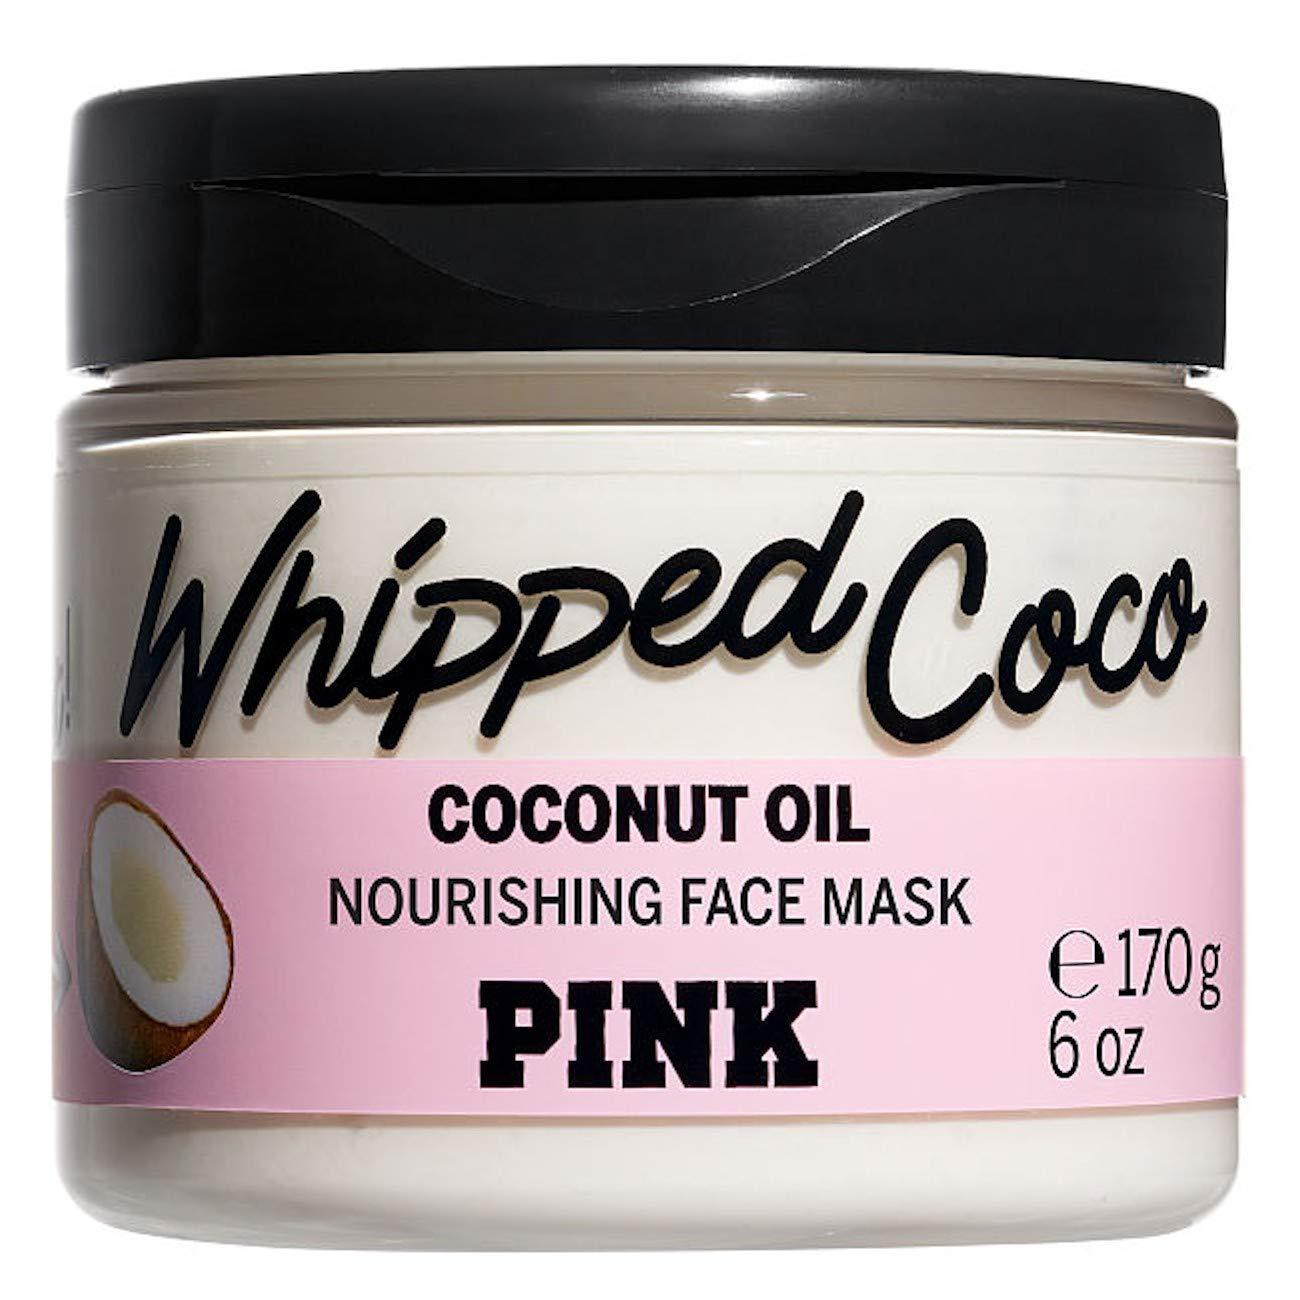 Victoria's Secret PINK Nourishing Face Mask, Coco Whip Coconut Oil